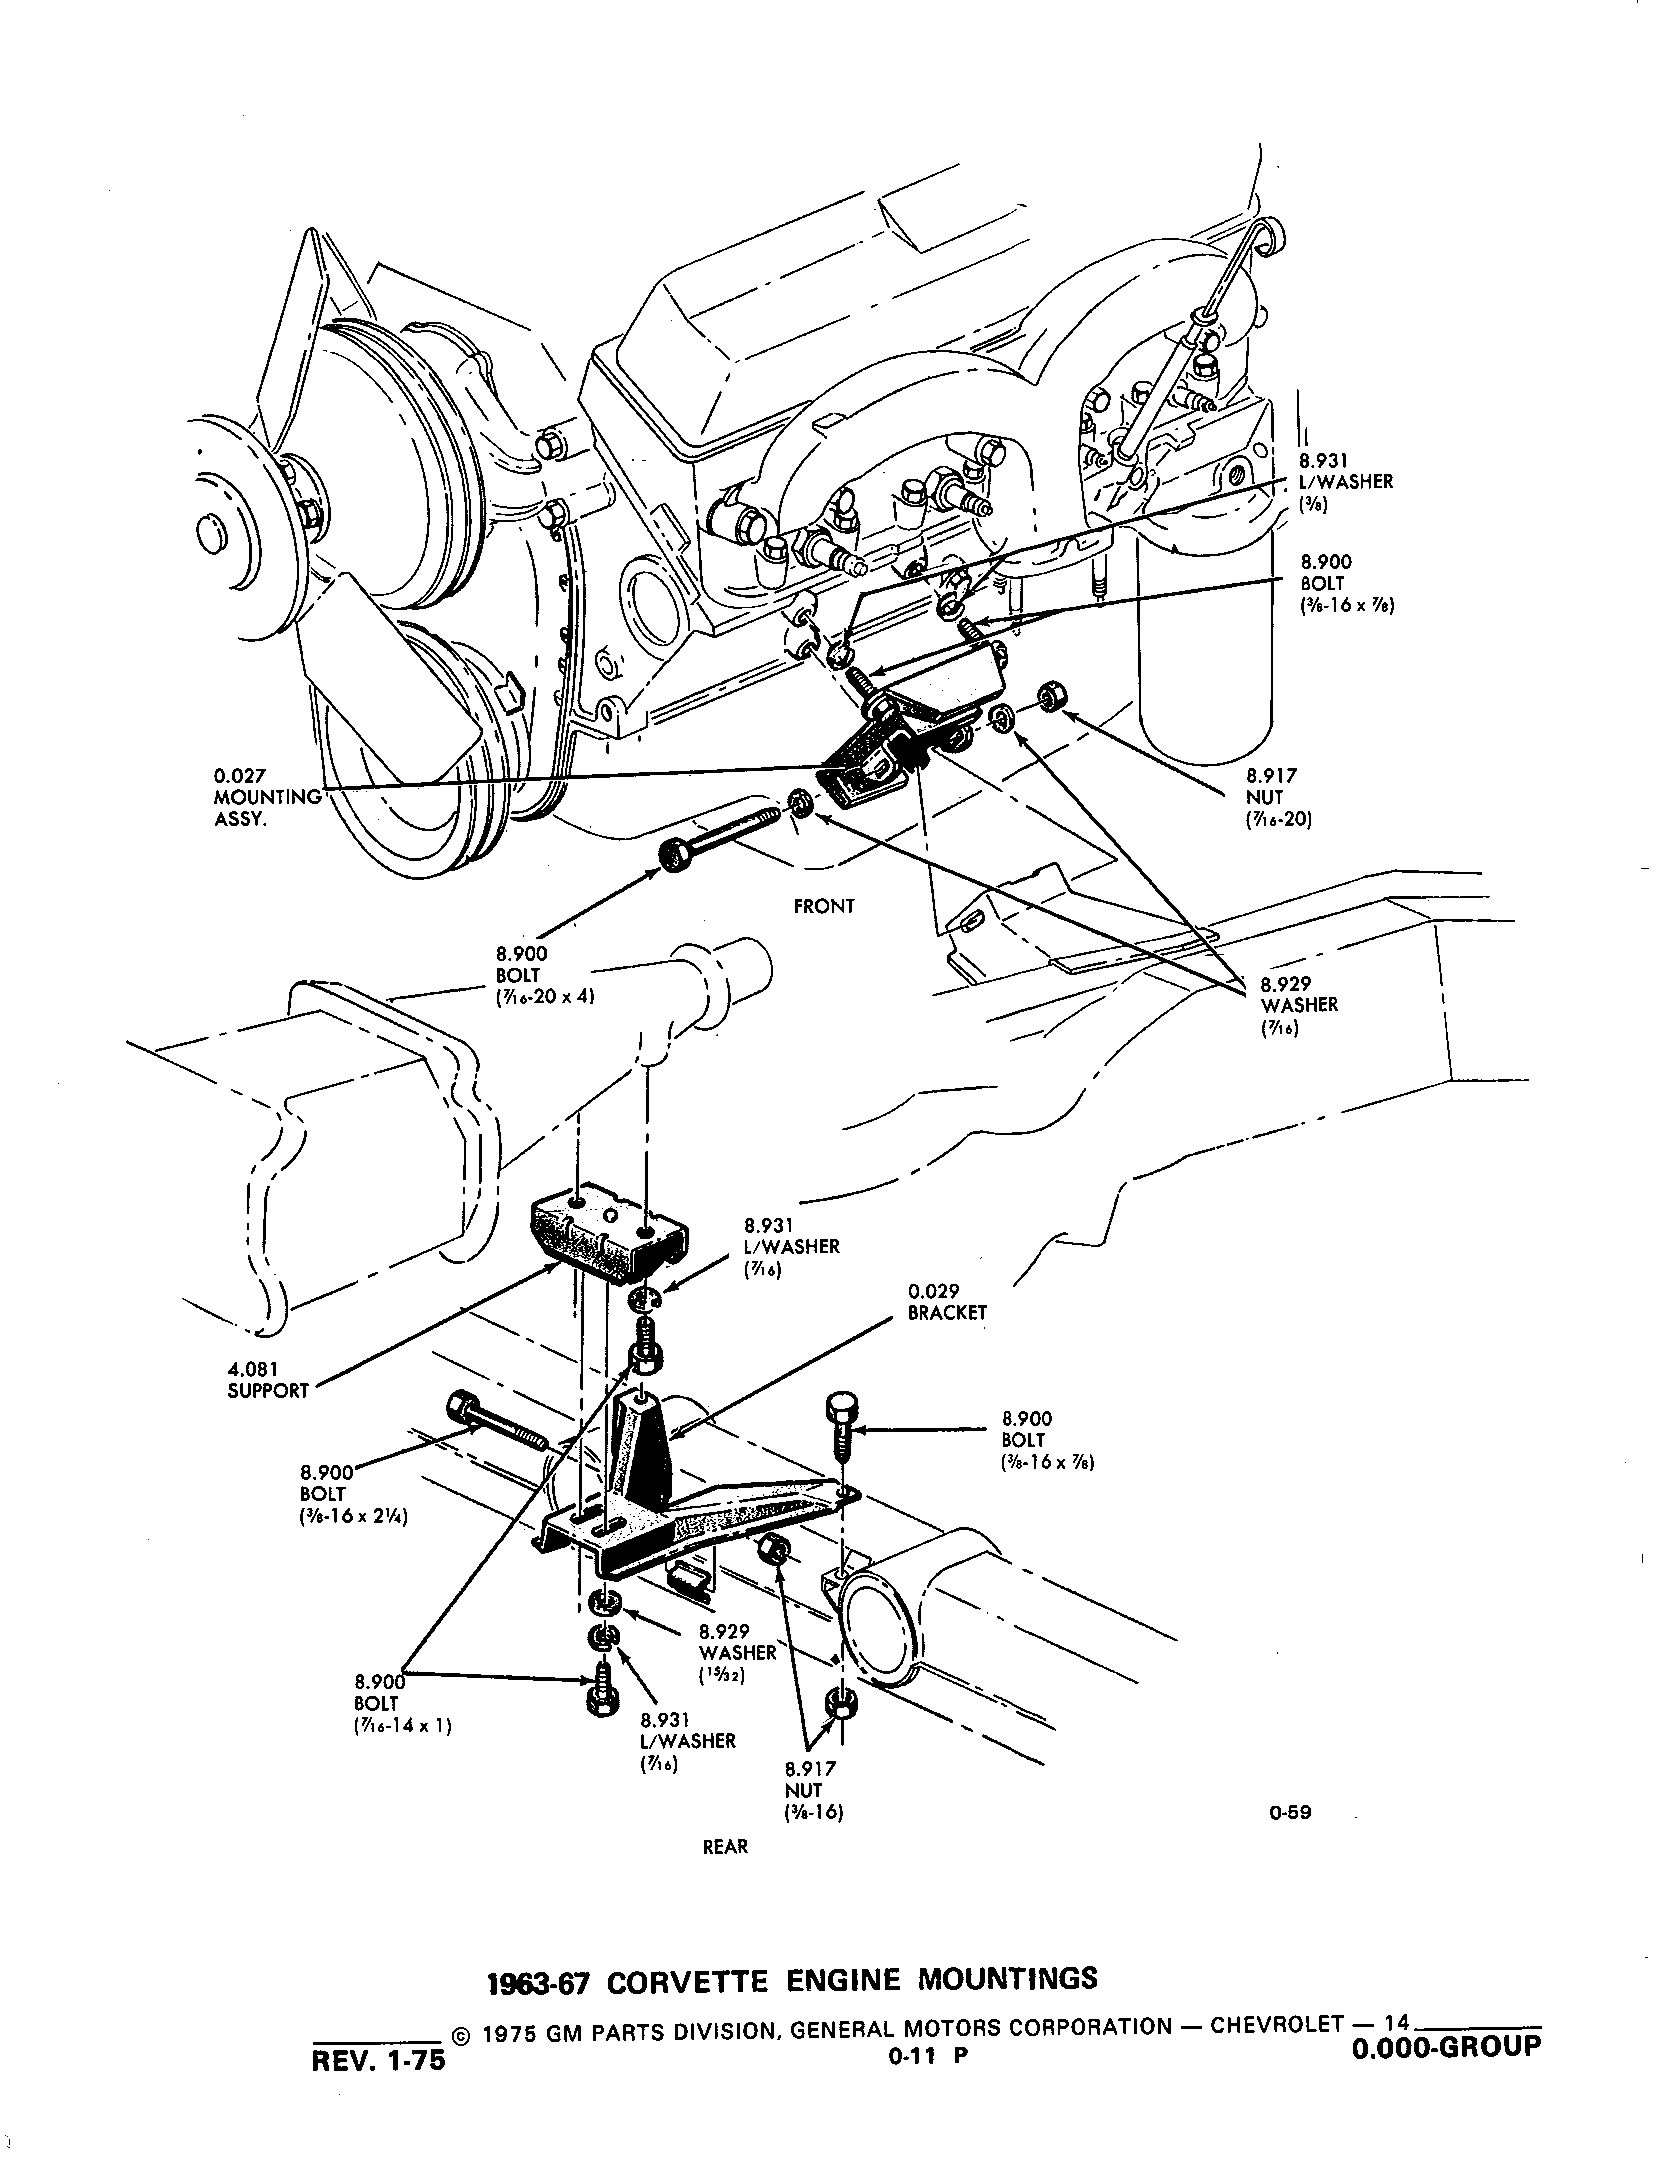 Group 0.000 Engine Clutch53-75 Corvette / 1953-1973